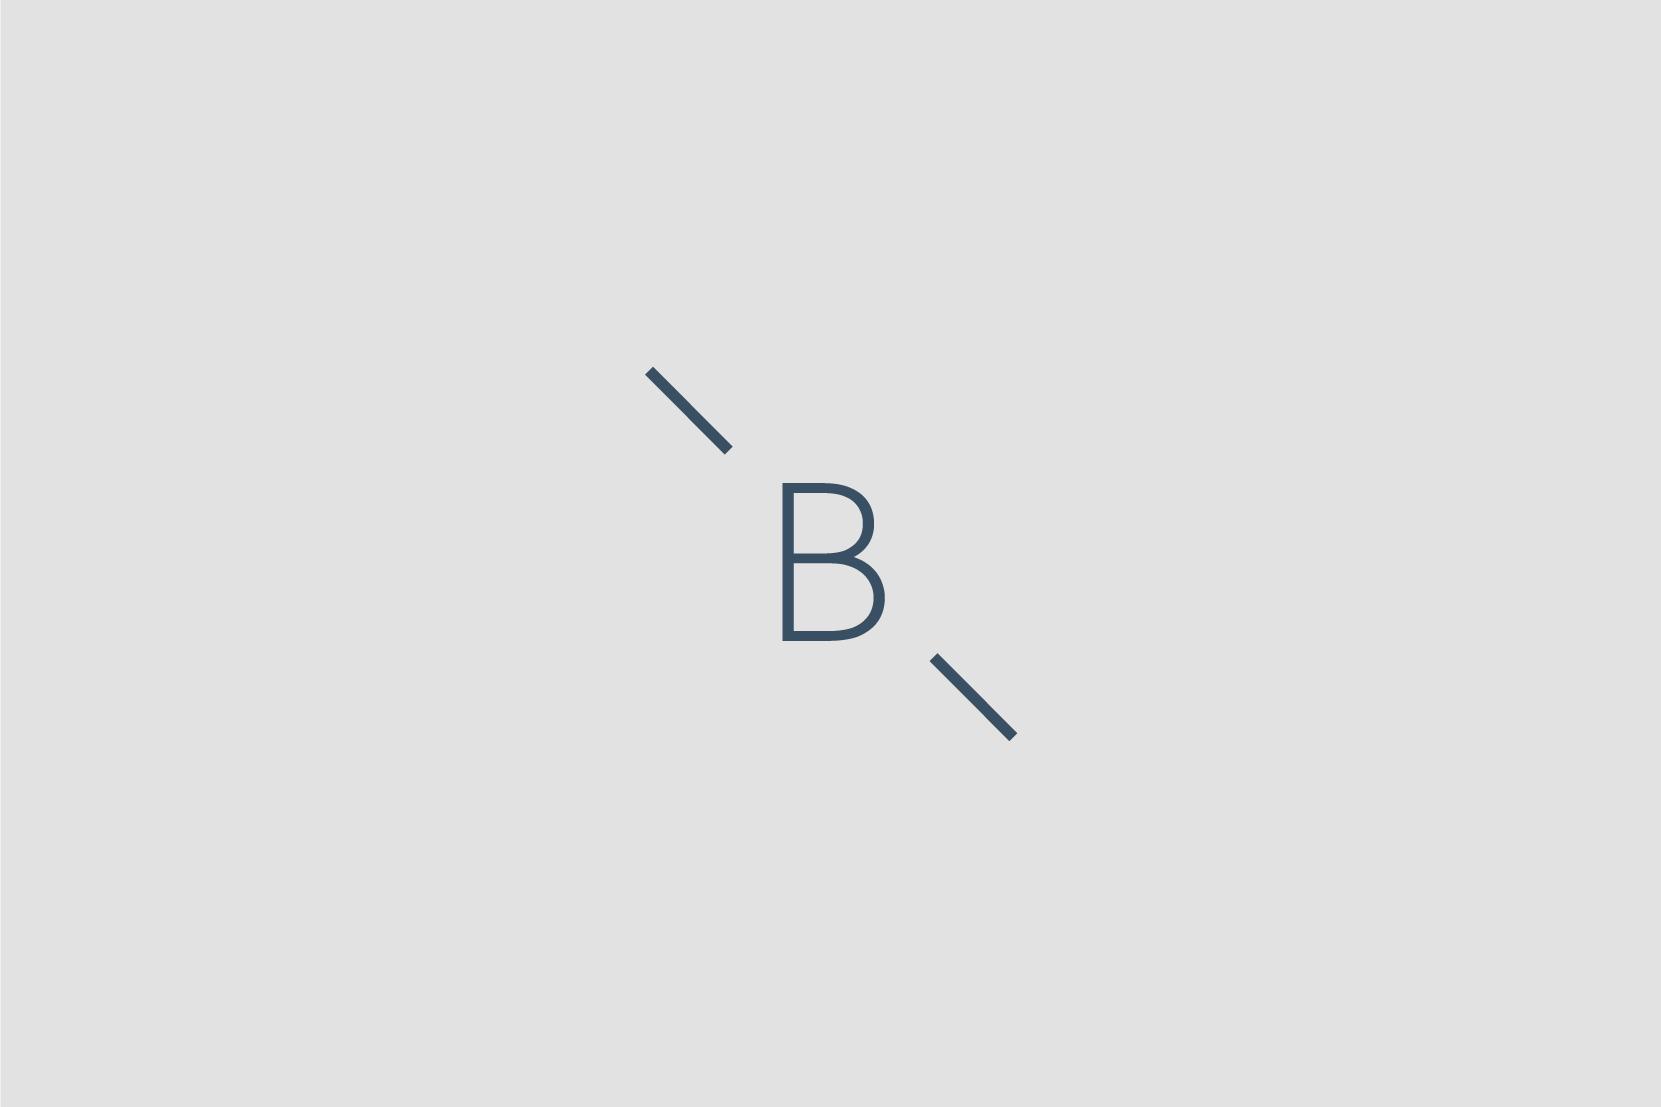 b-icon